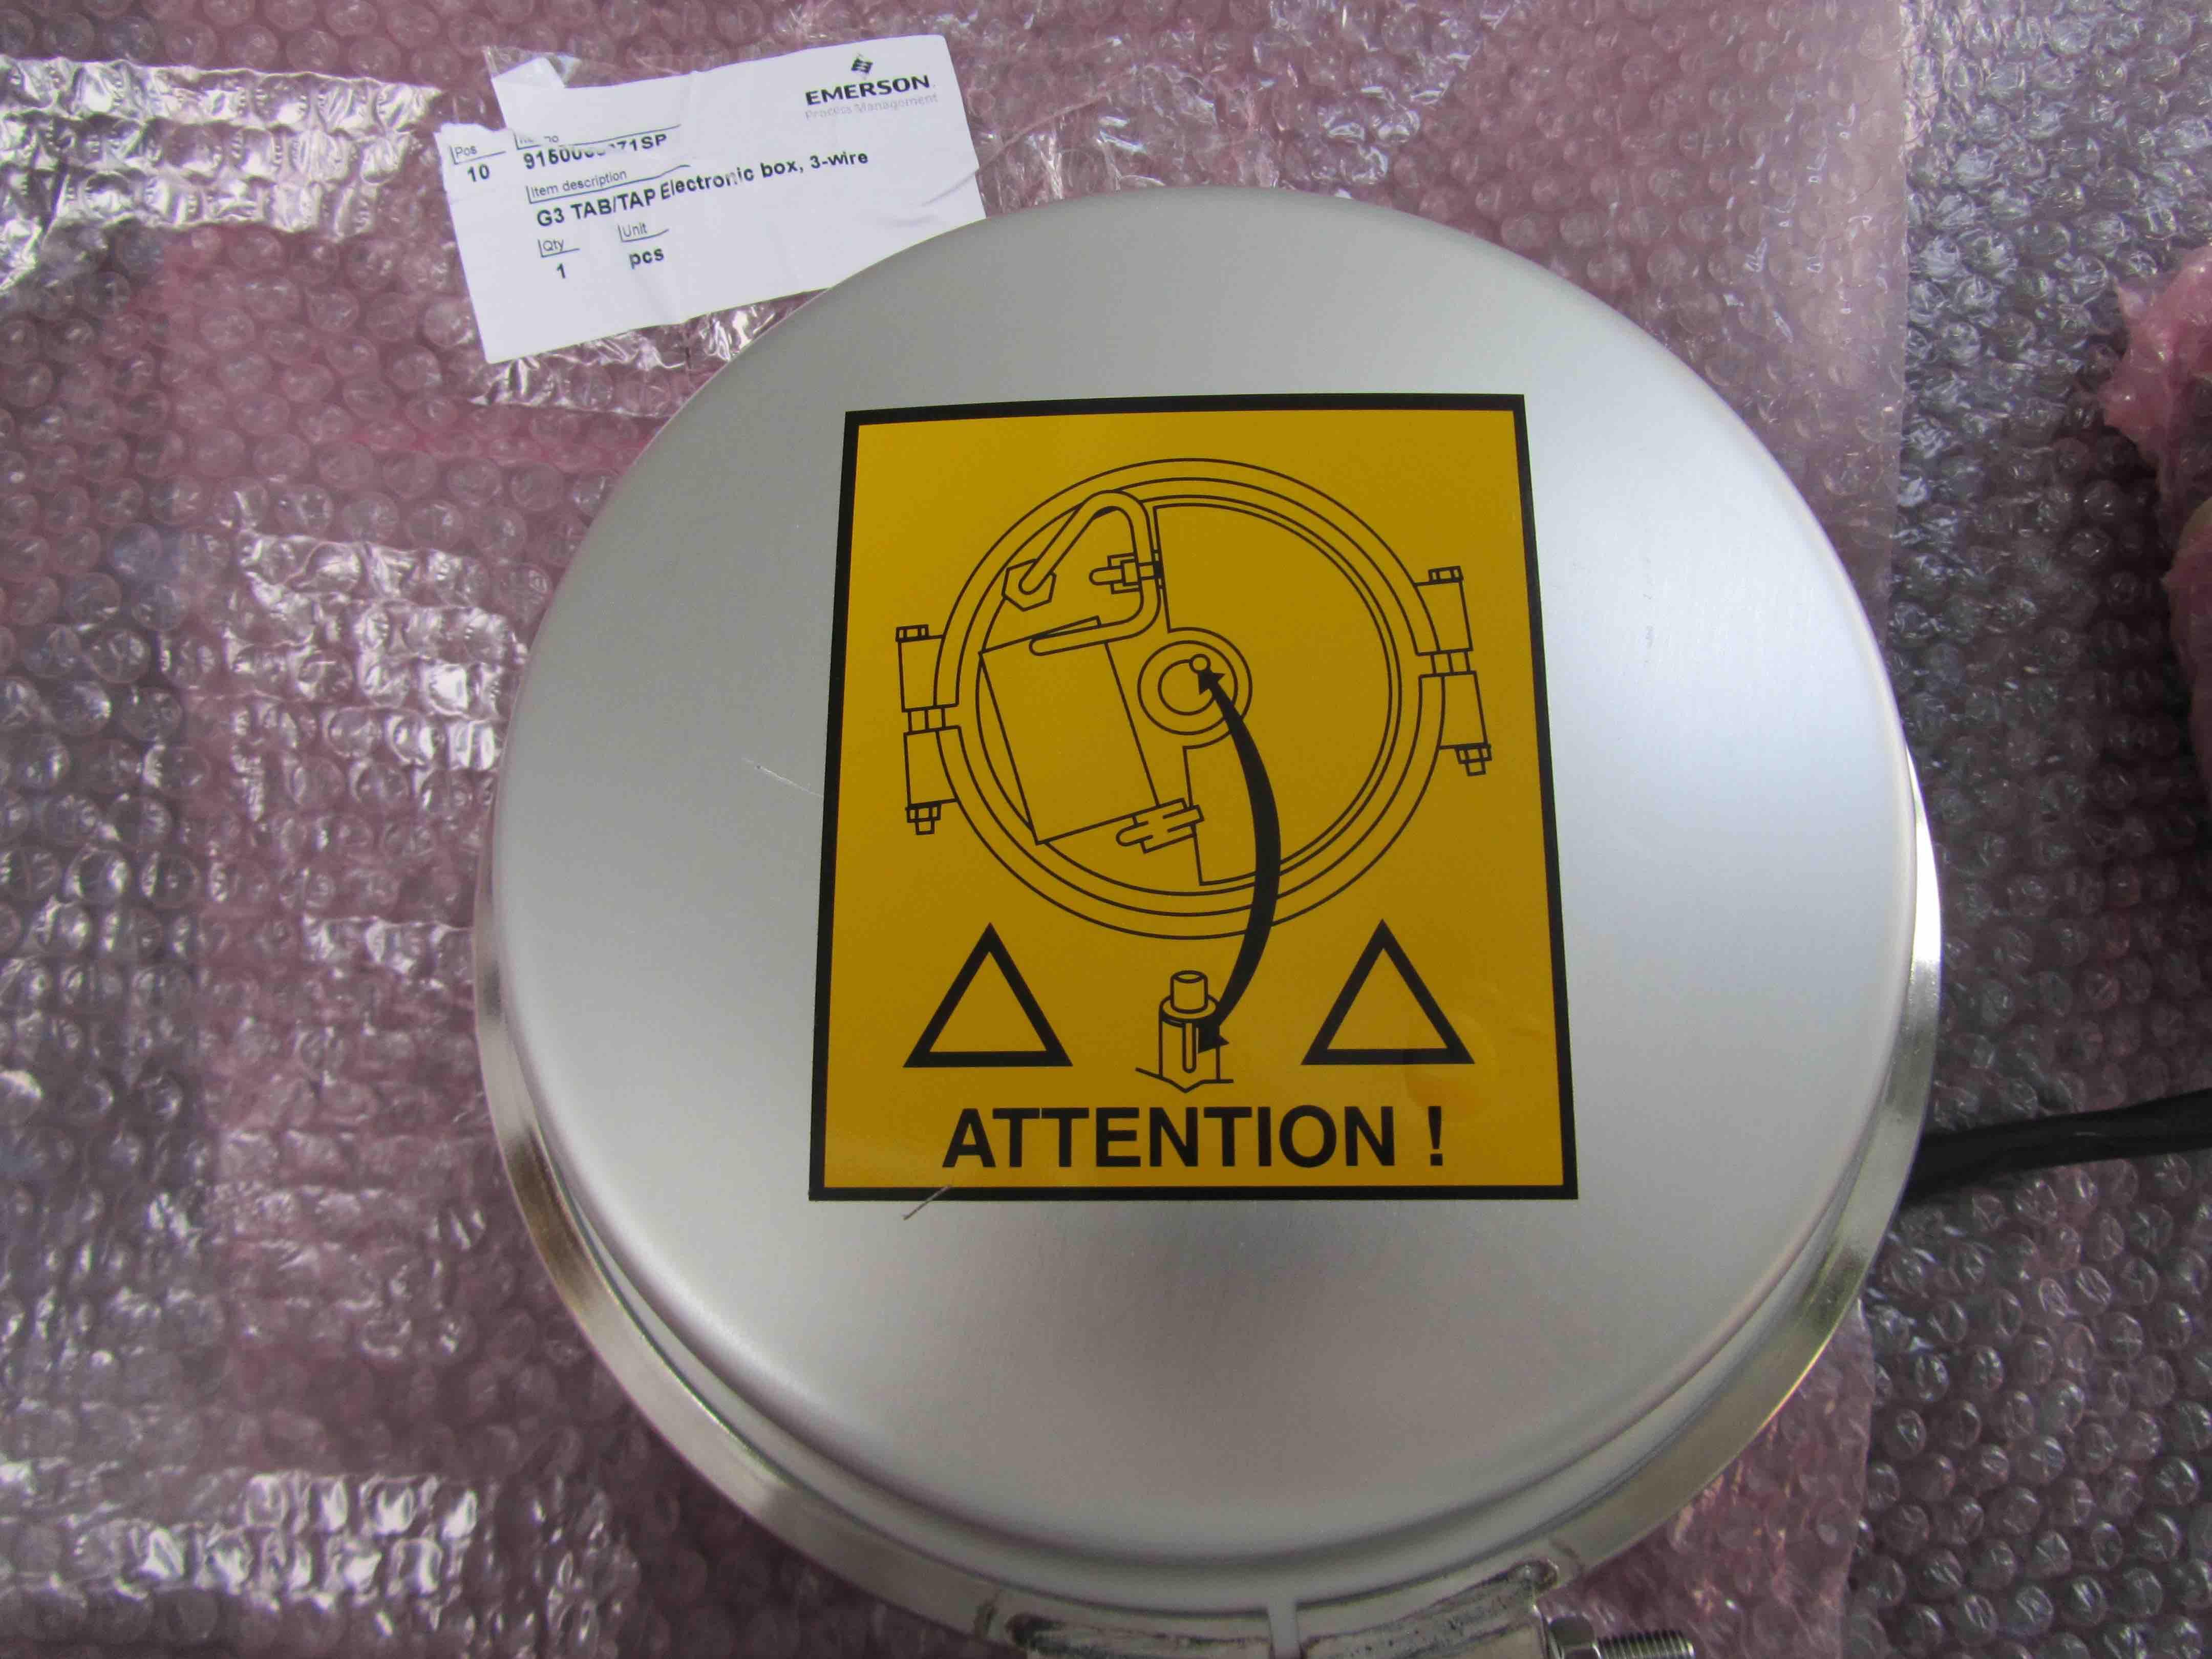 9150068-871 G3 Electronic Box